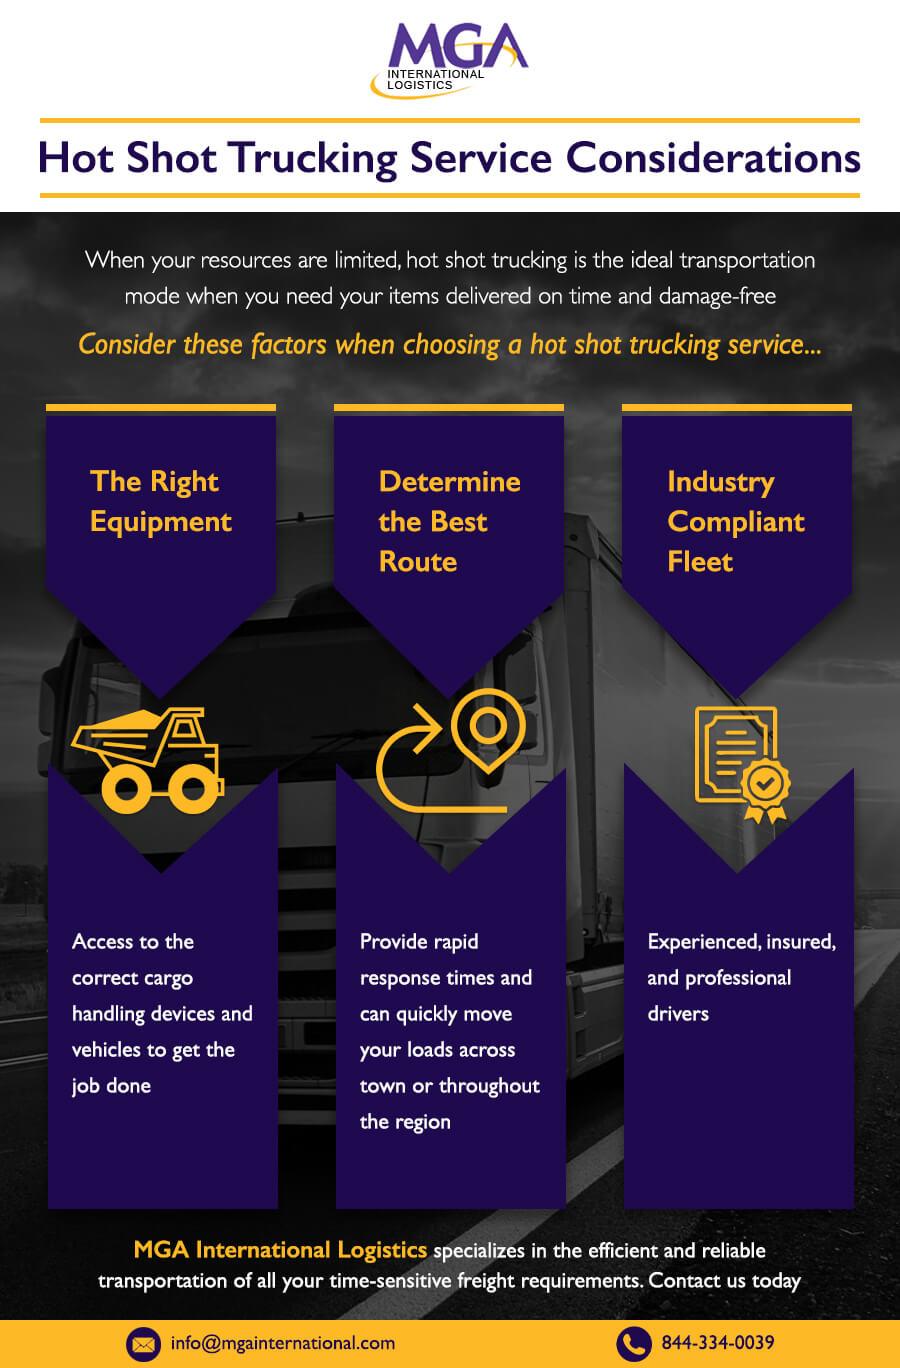 Hot Shot Trucking Services